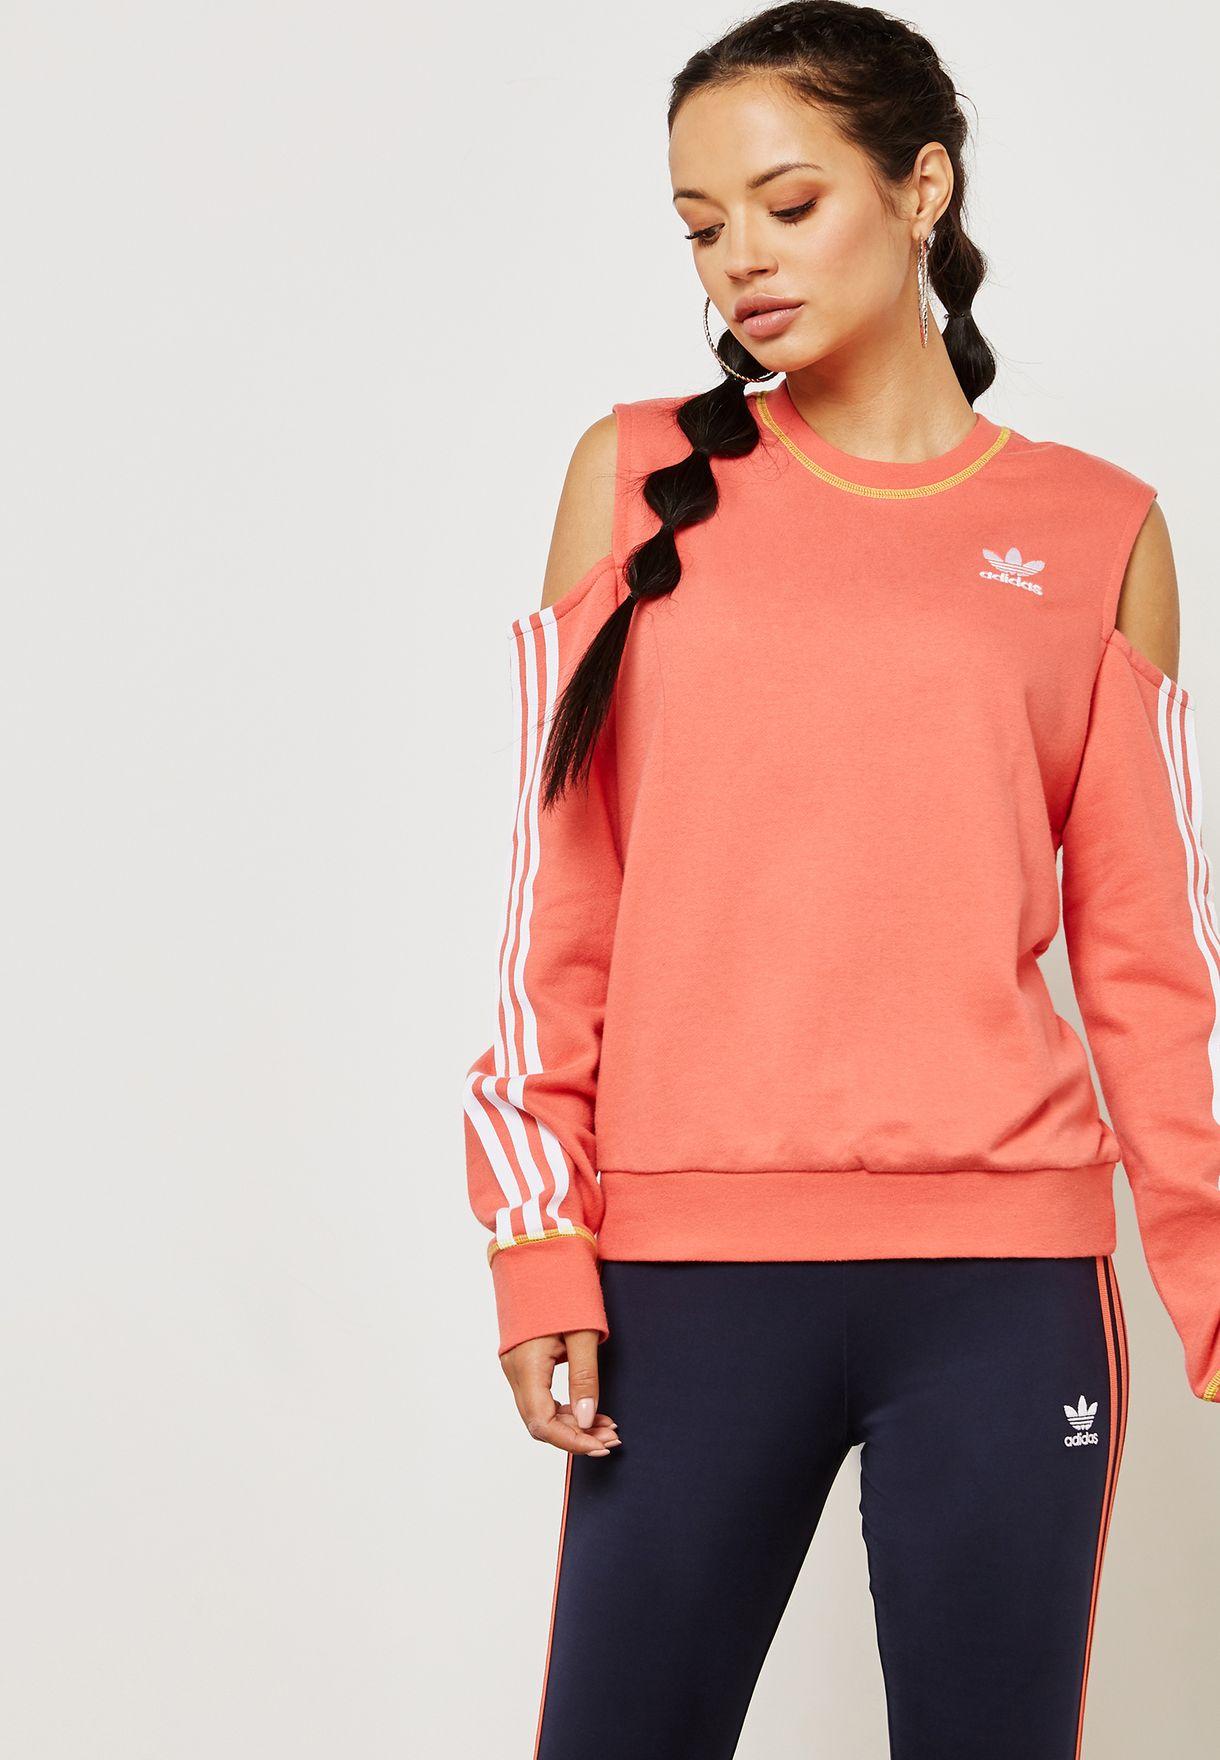 711cae7d8 Shop adidas Originals pink 3 Stripe Cut Out Sweatshirt DH2995 for ...